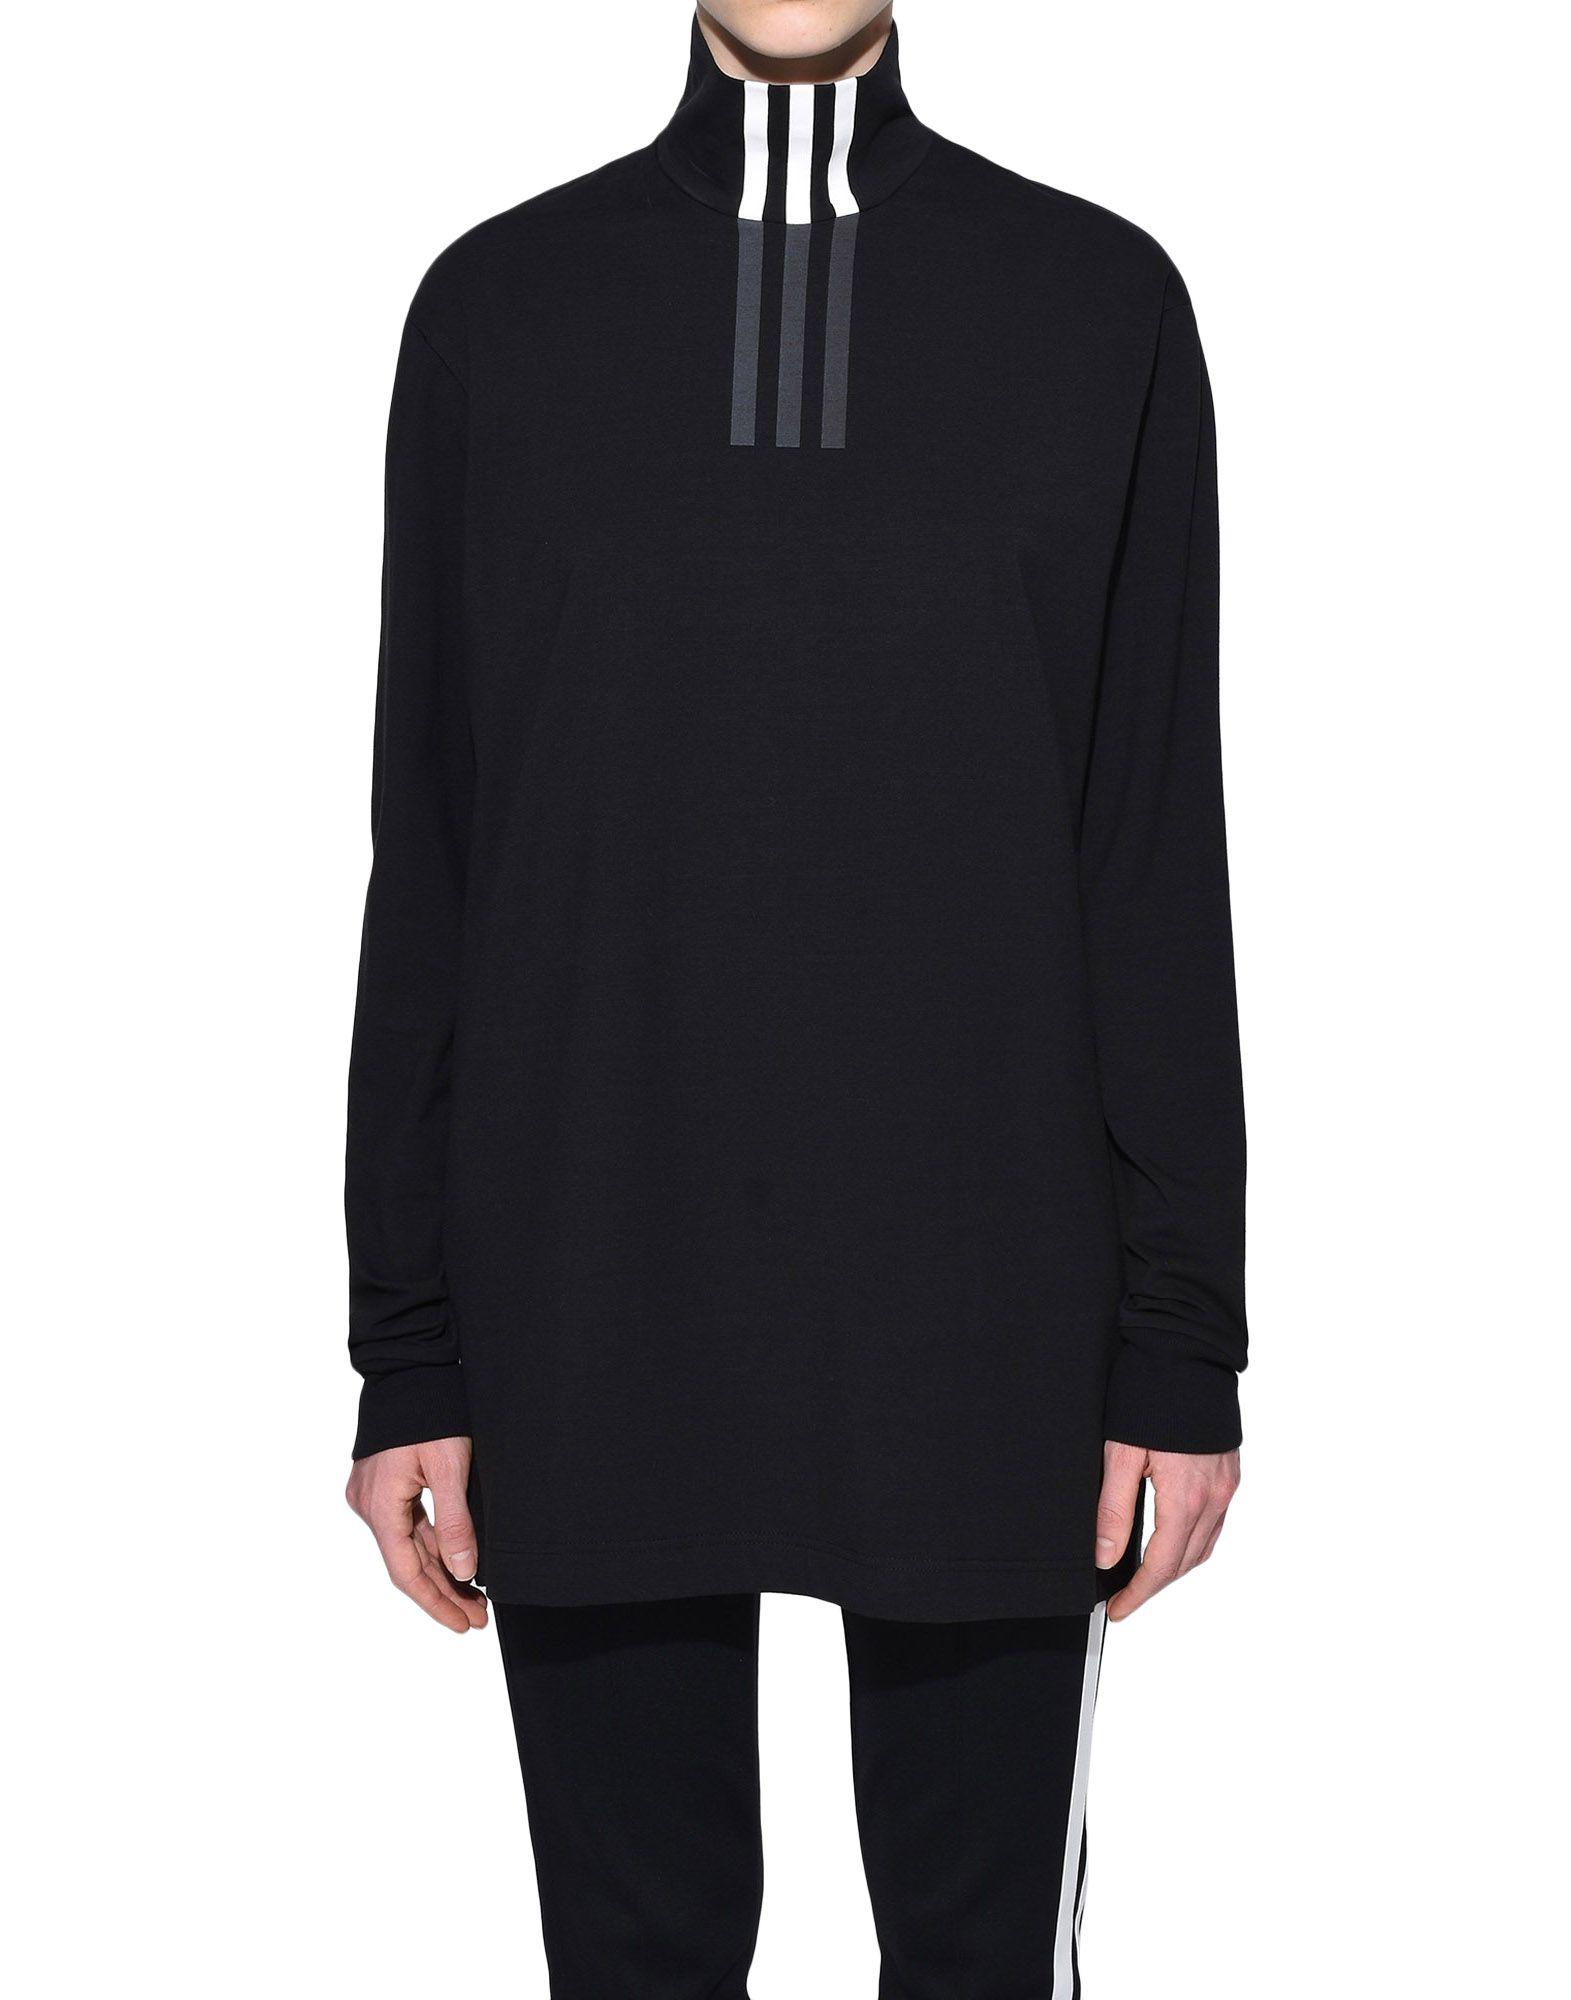 Y-3 Y-3 3-Stripes High Neck Tee Long sleeve t-shirt Woman r